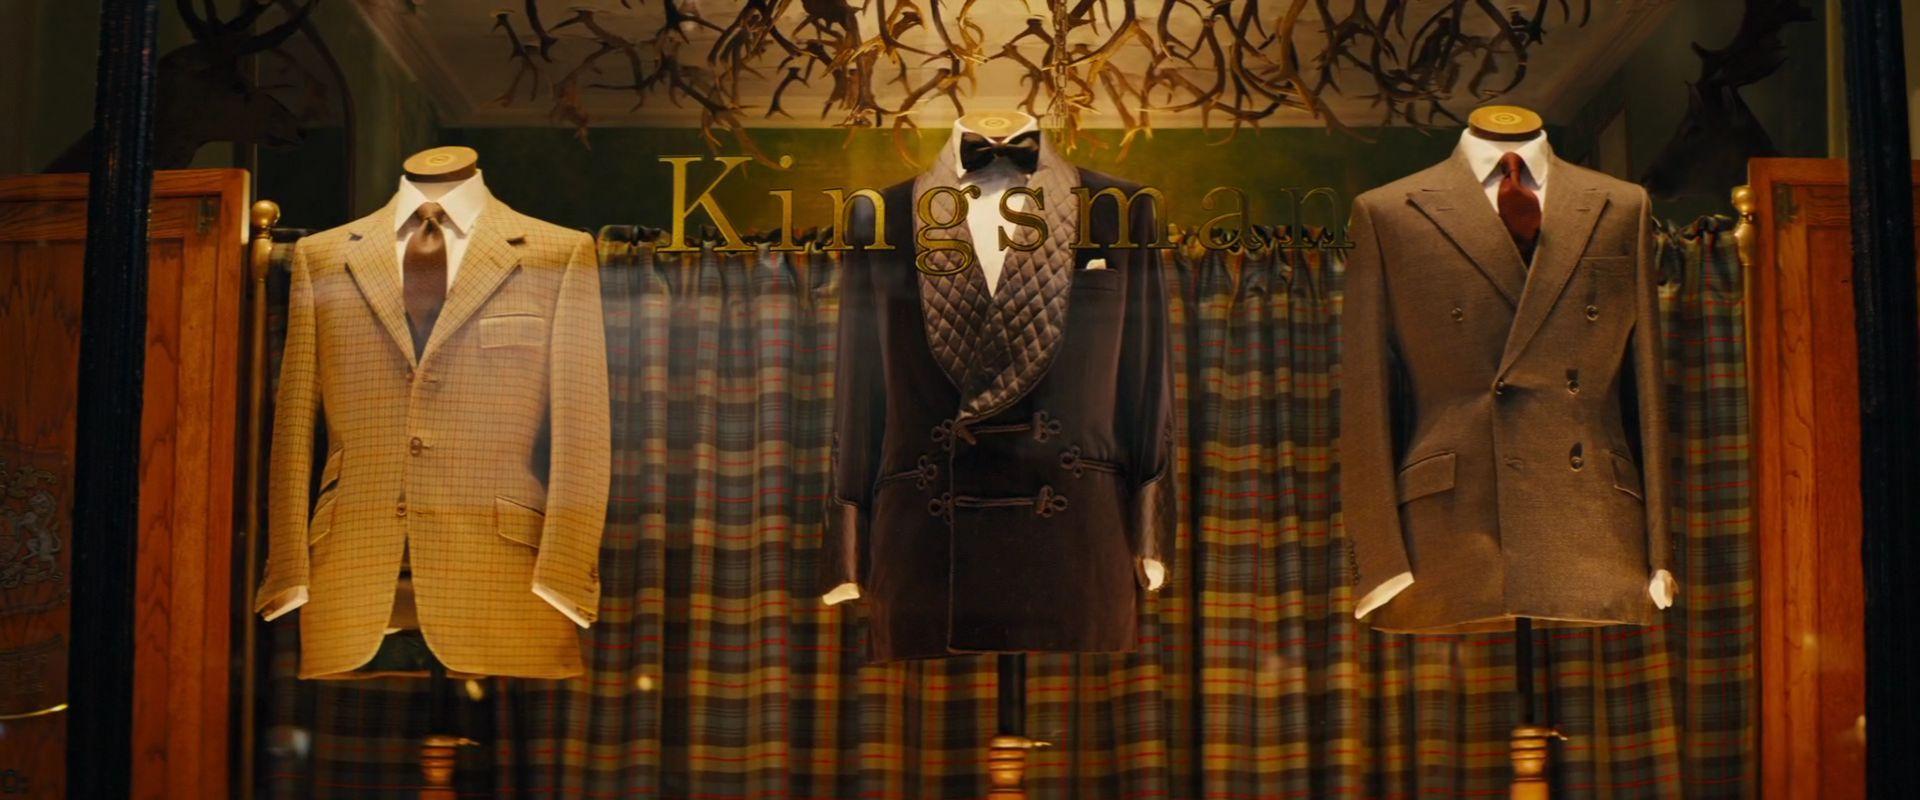 Kingsman Suits The Kingsman Directory Fandom Powered